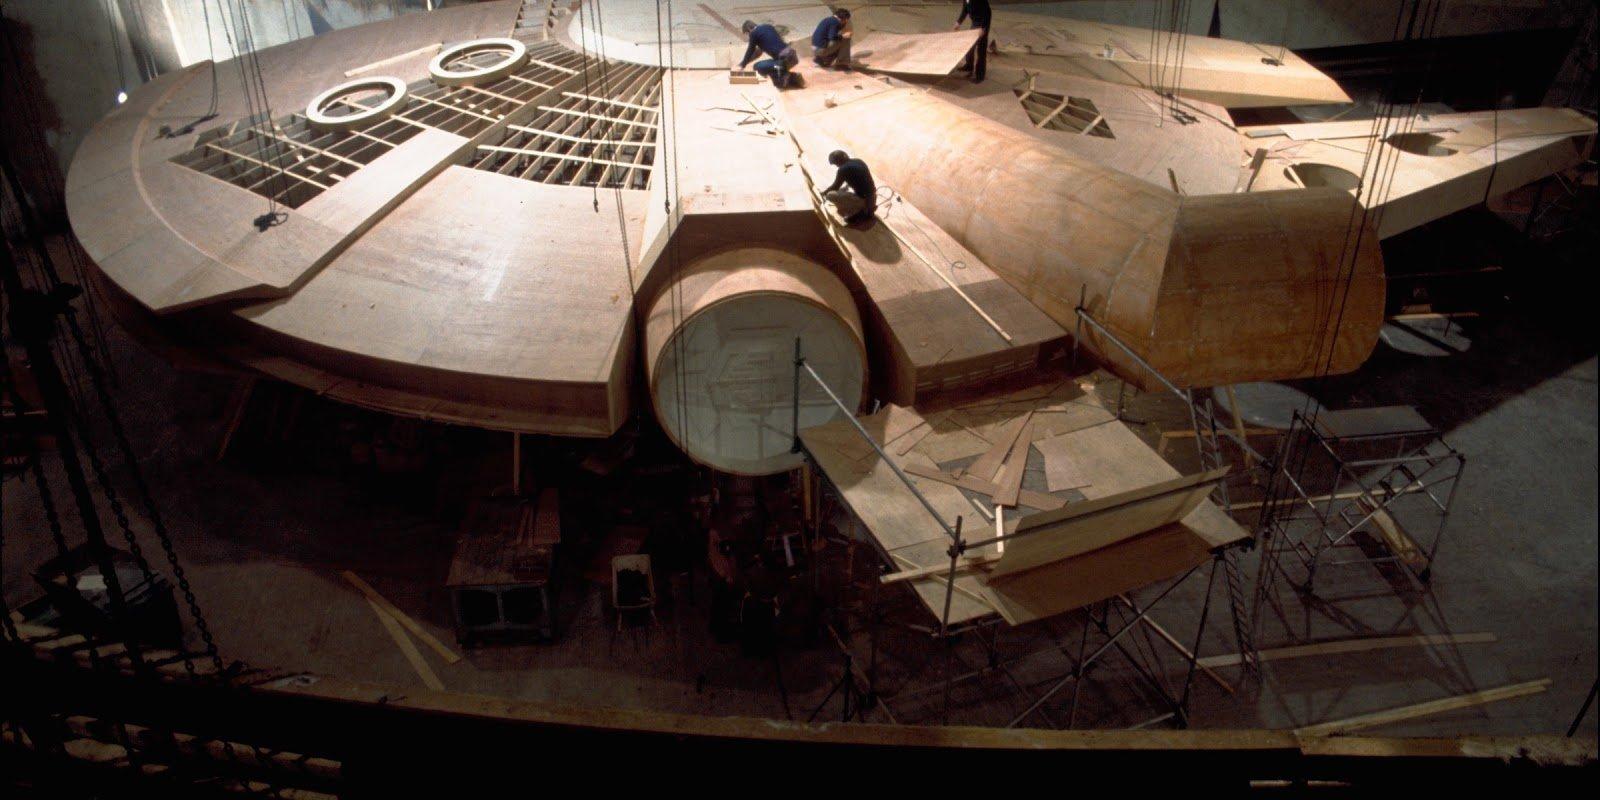 Star Wars Secret The Empire Strikes Back Millennium Falcon